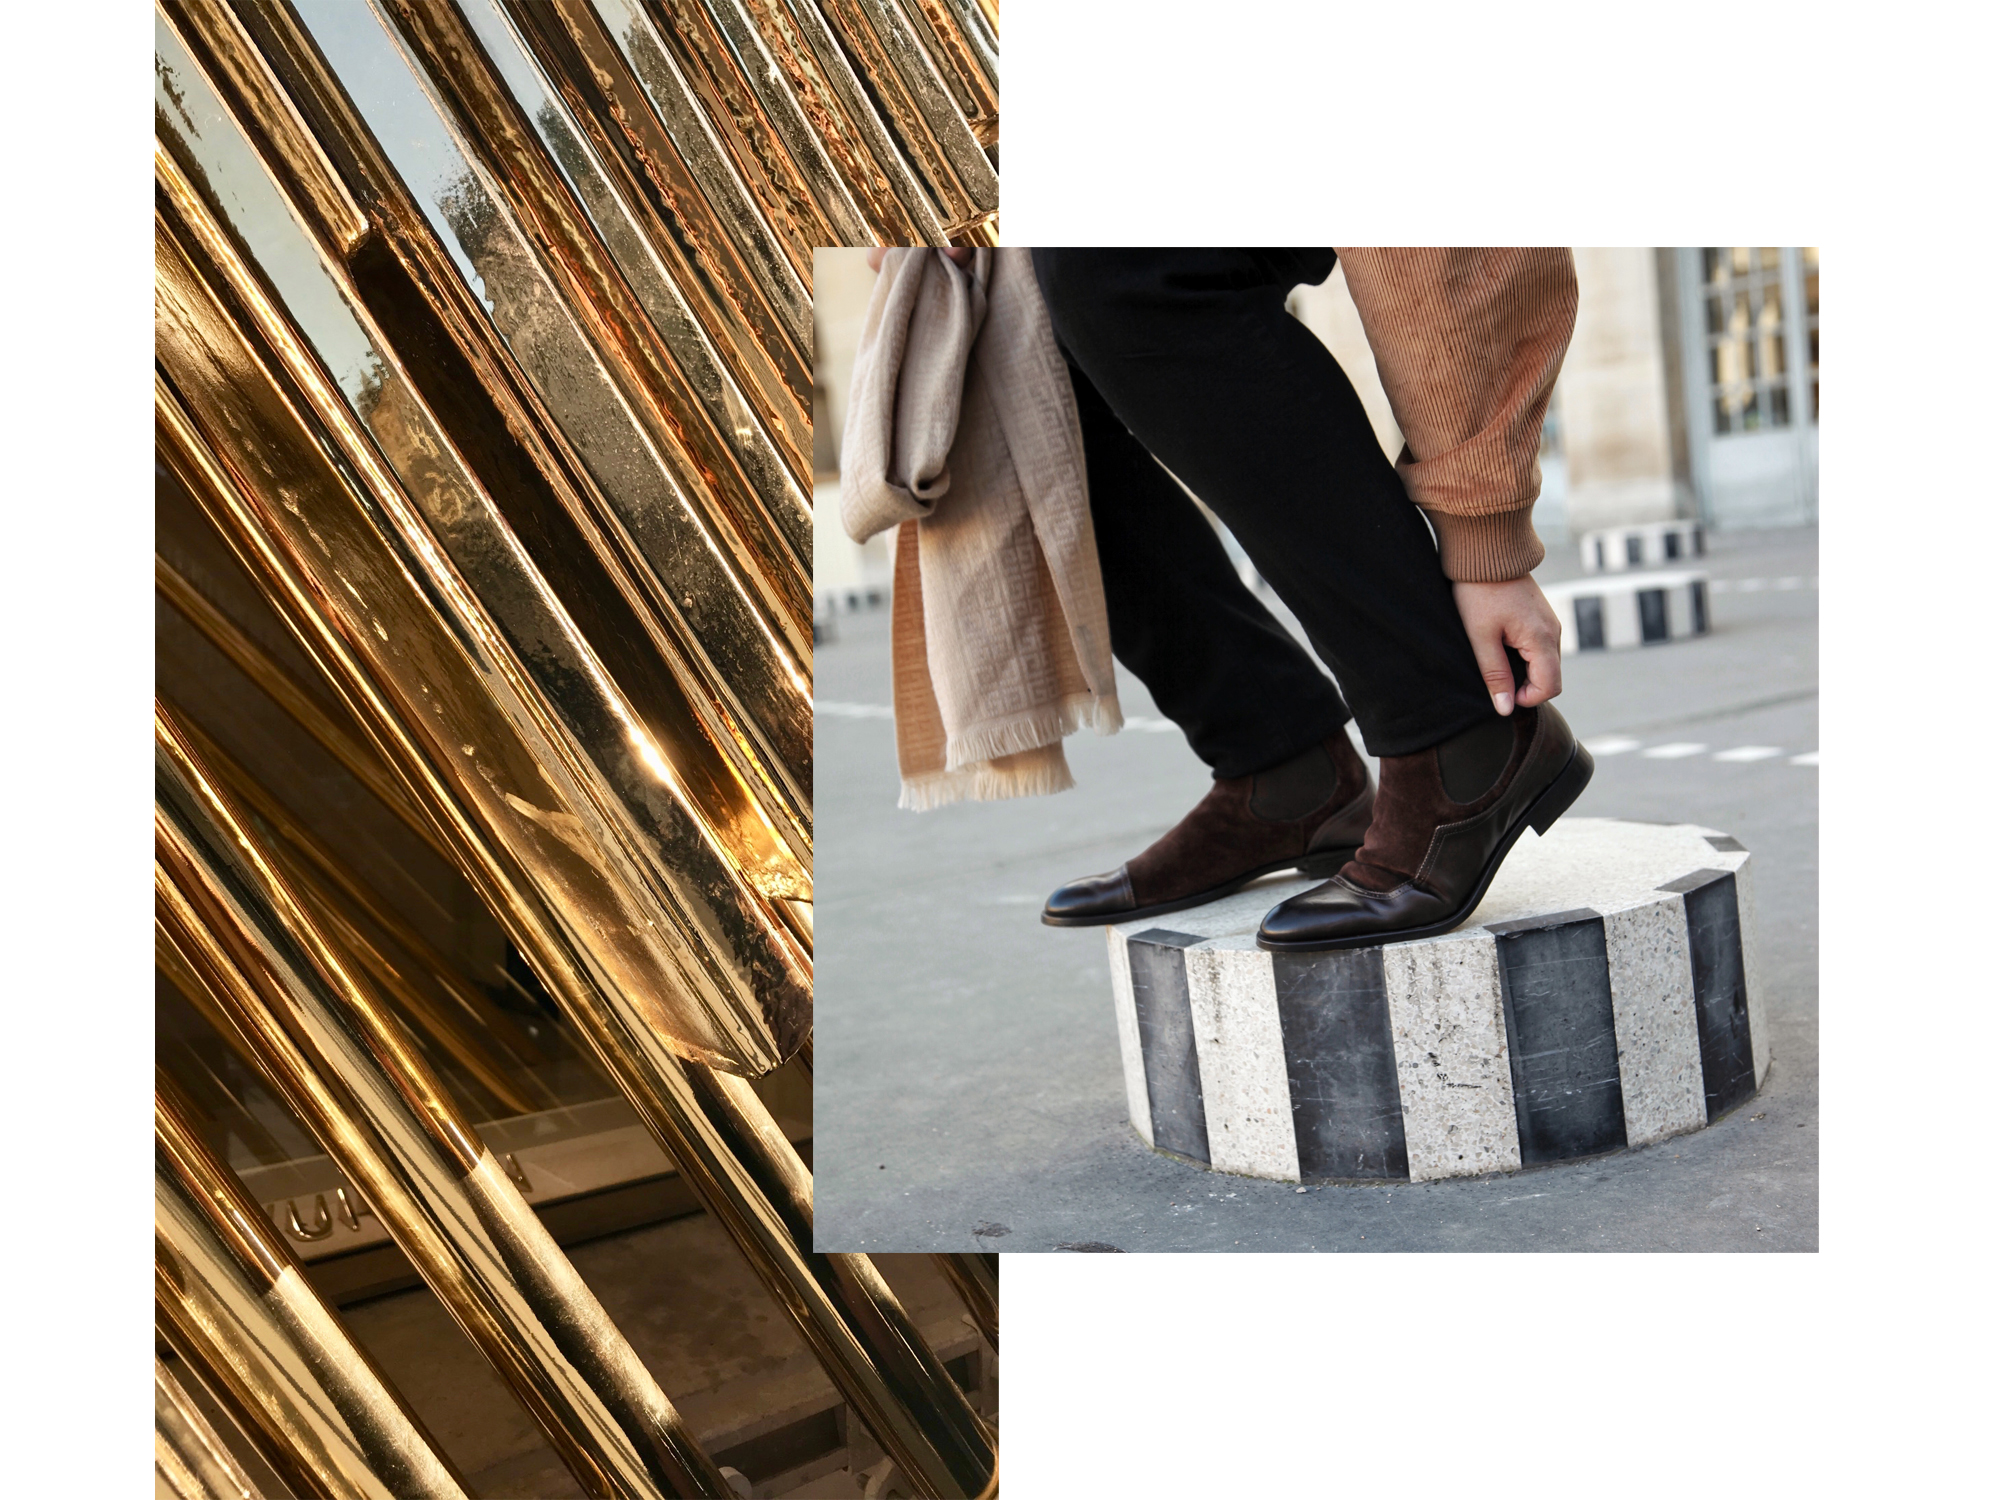 Shoes courtesy of  Fratelli Rossetti